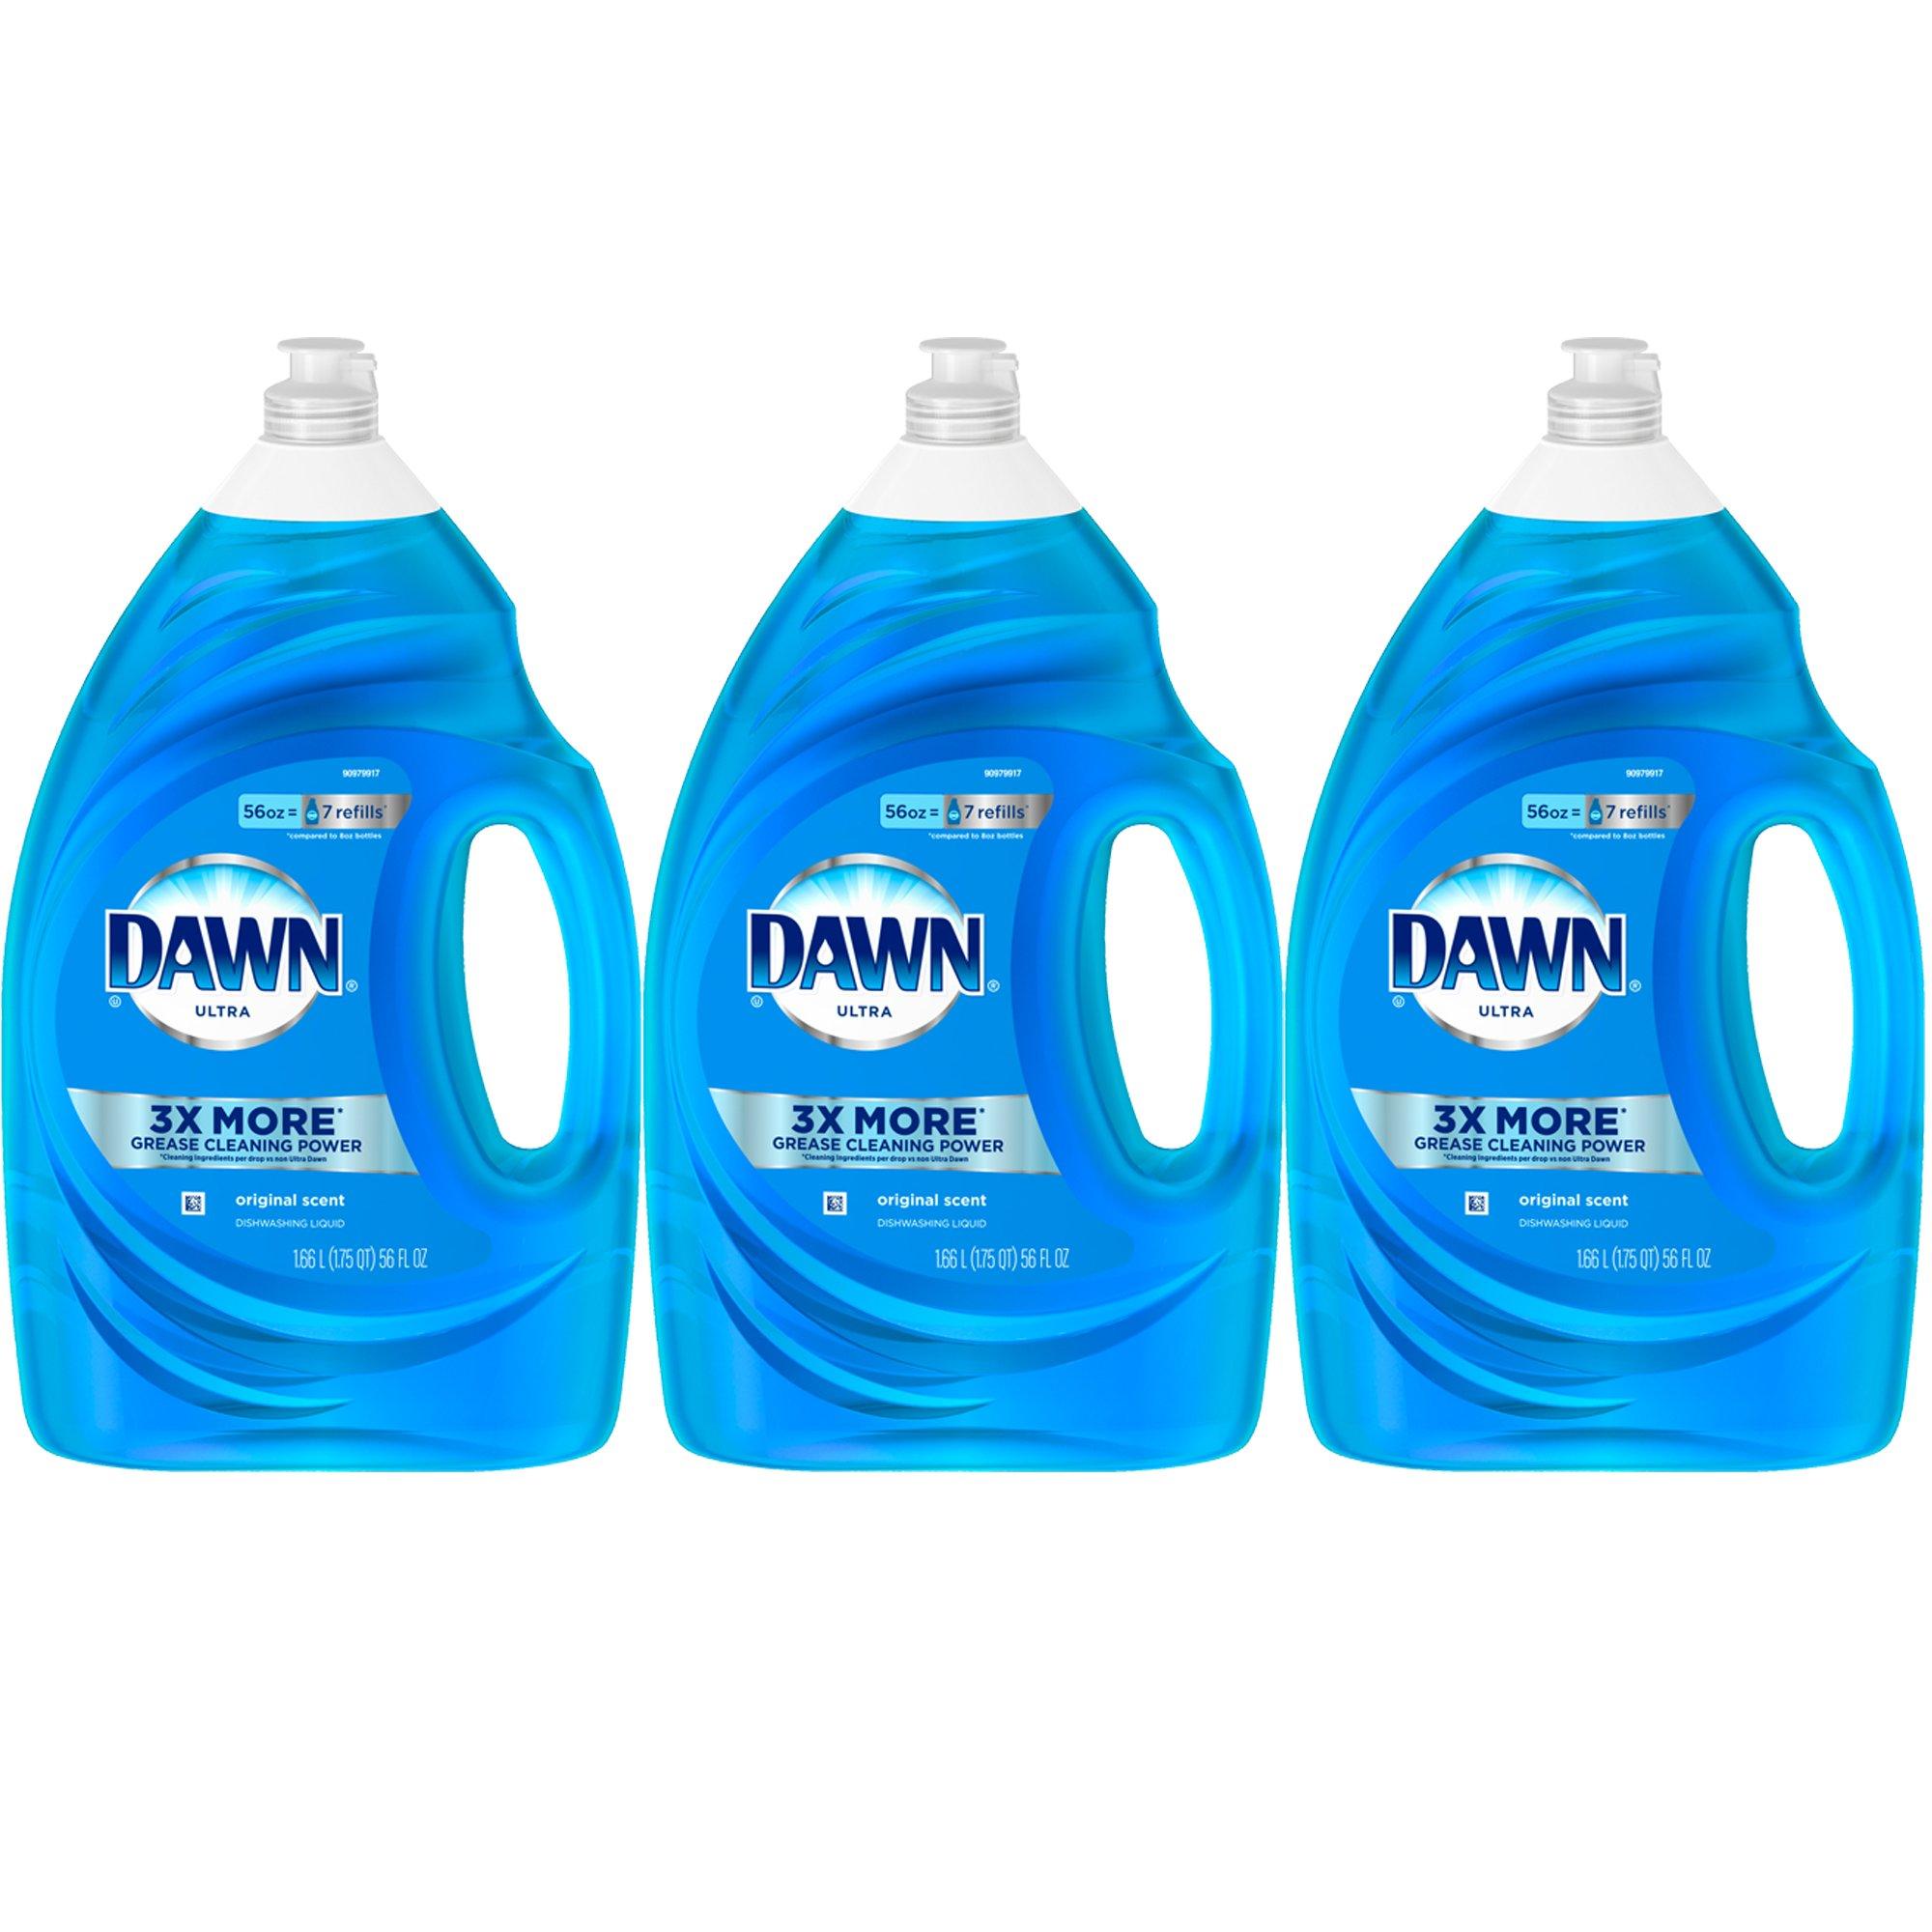 Dawn Dish Soap, Ultra Dishwashing Liquid, Original Scent, 56 fl oz, 3-Pack